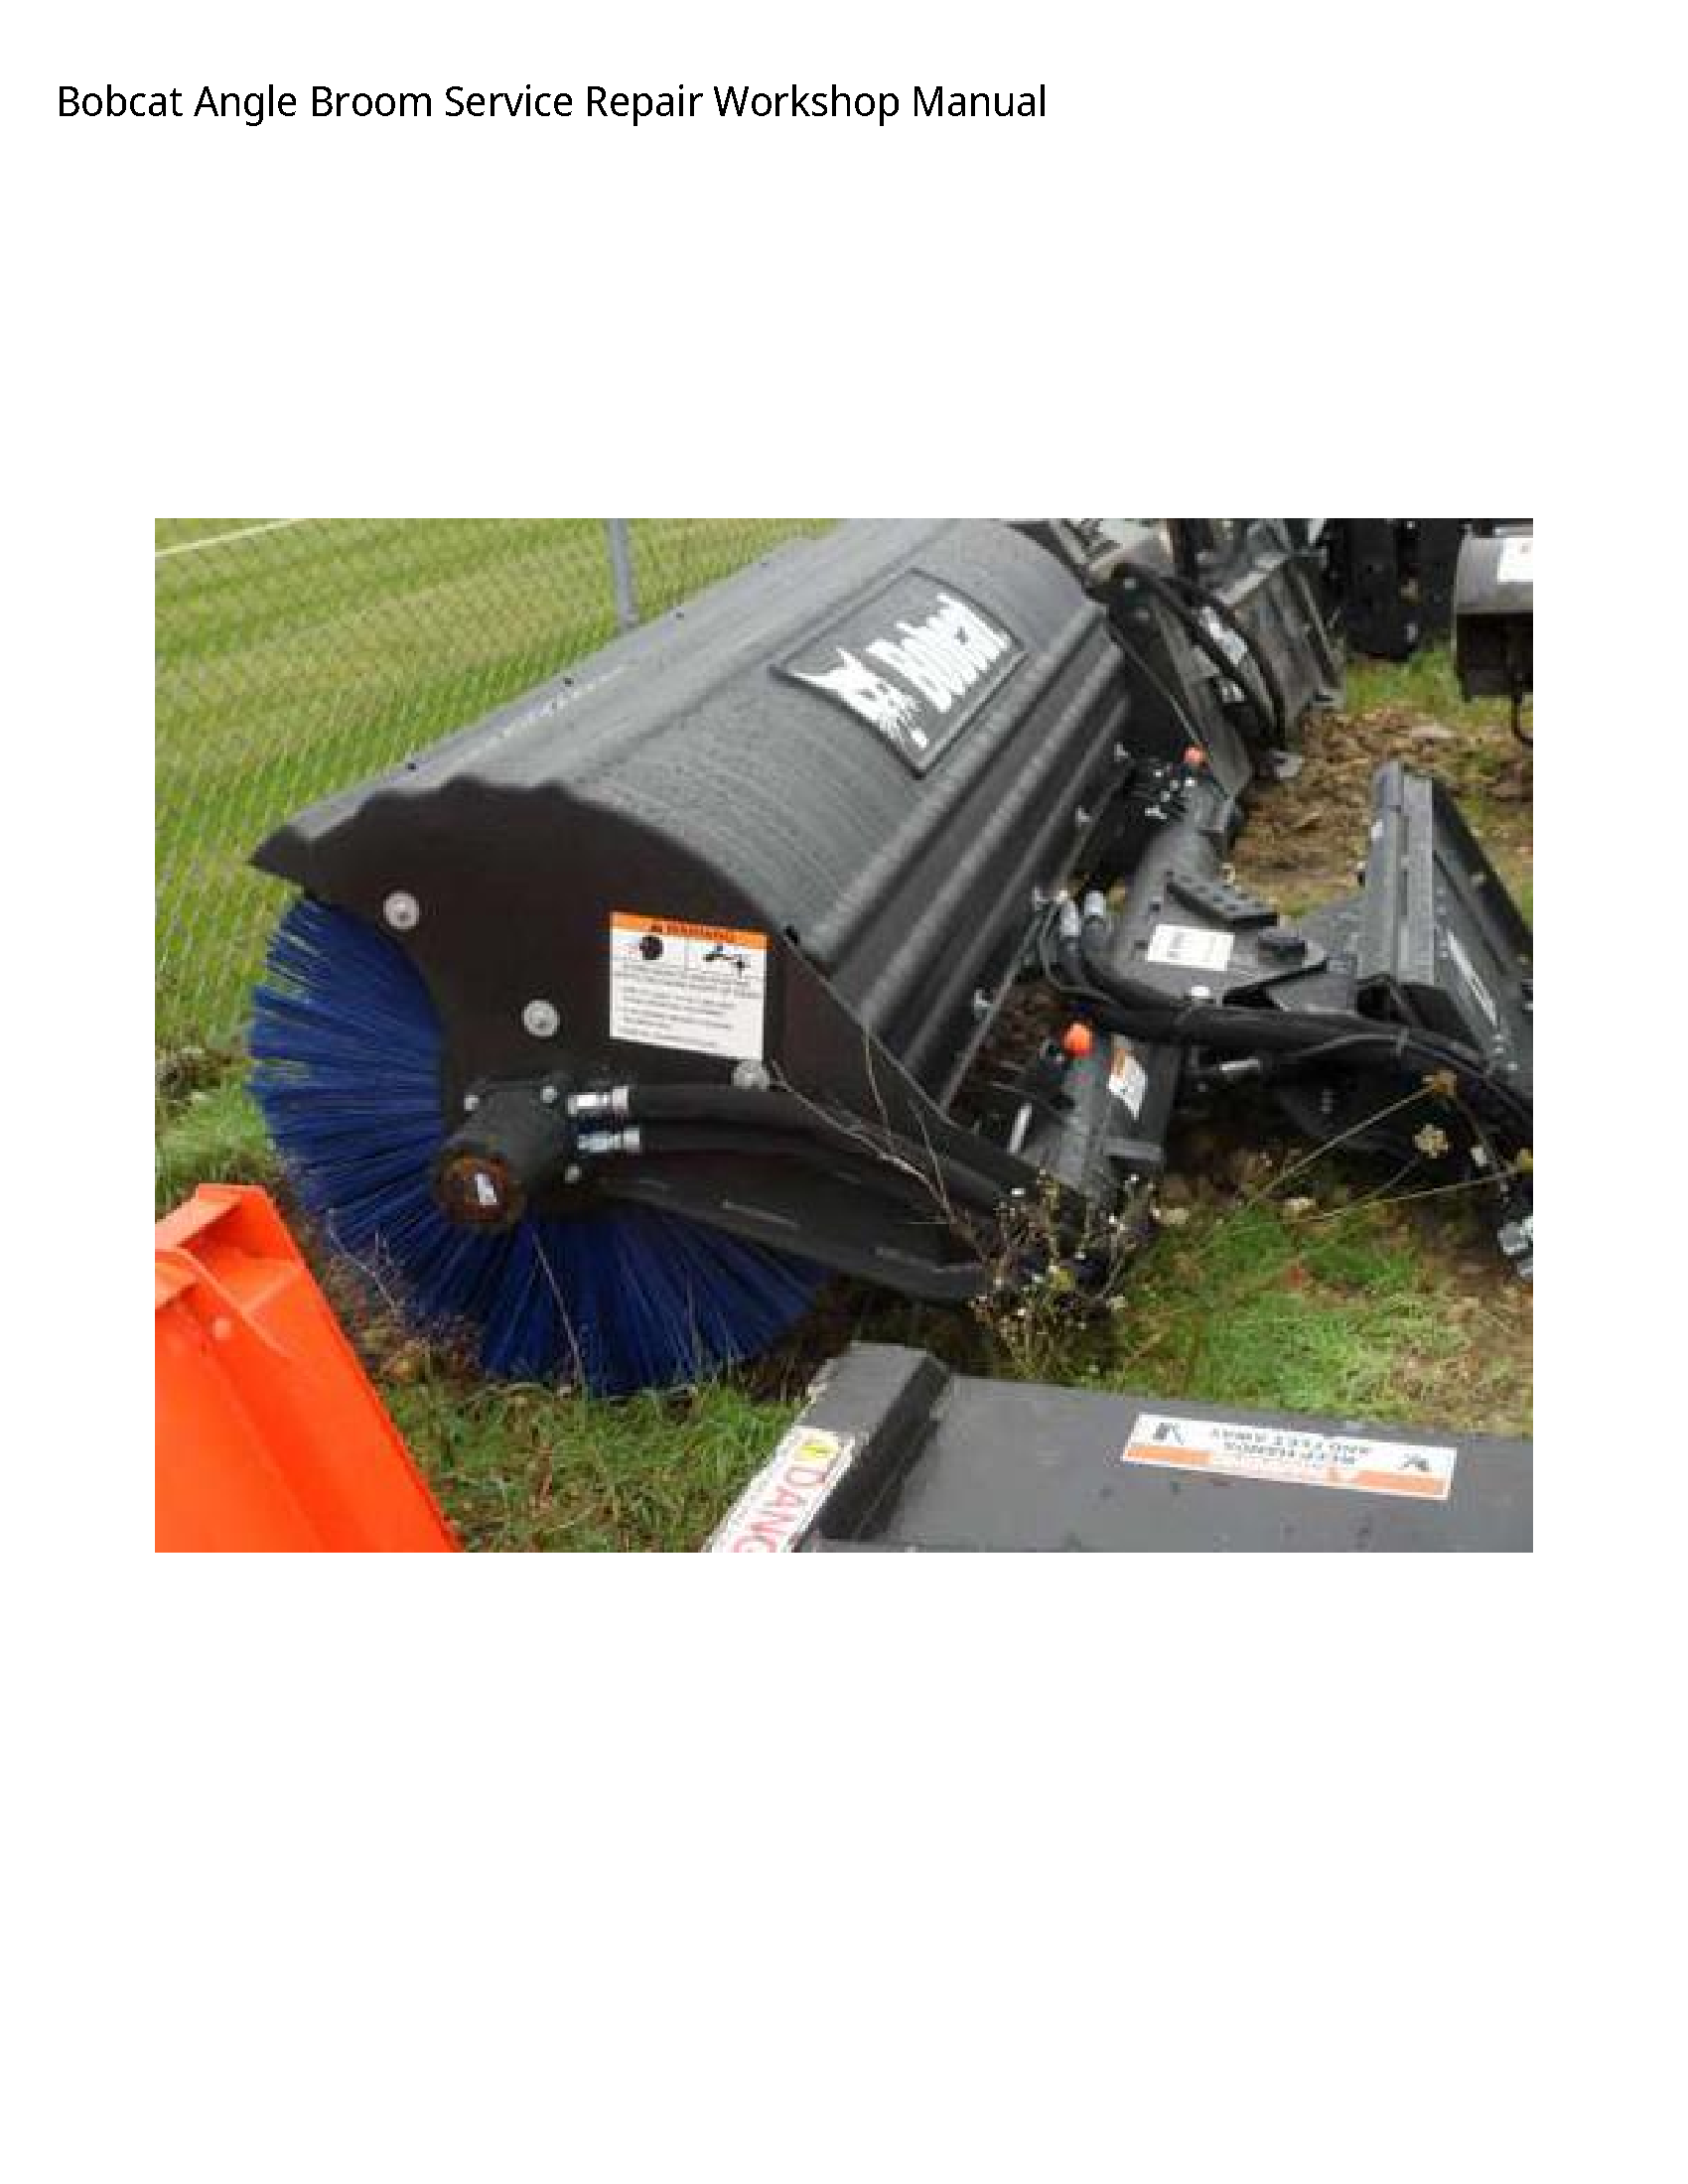 Bobcat Angle Broom Manual Repair Hydraulic Systems Mini Excavator